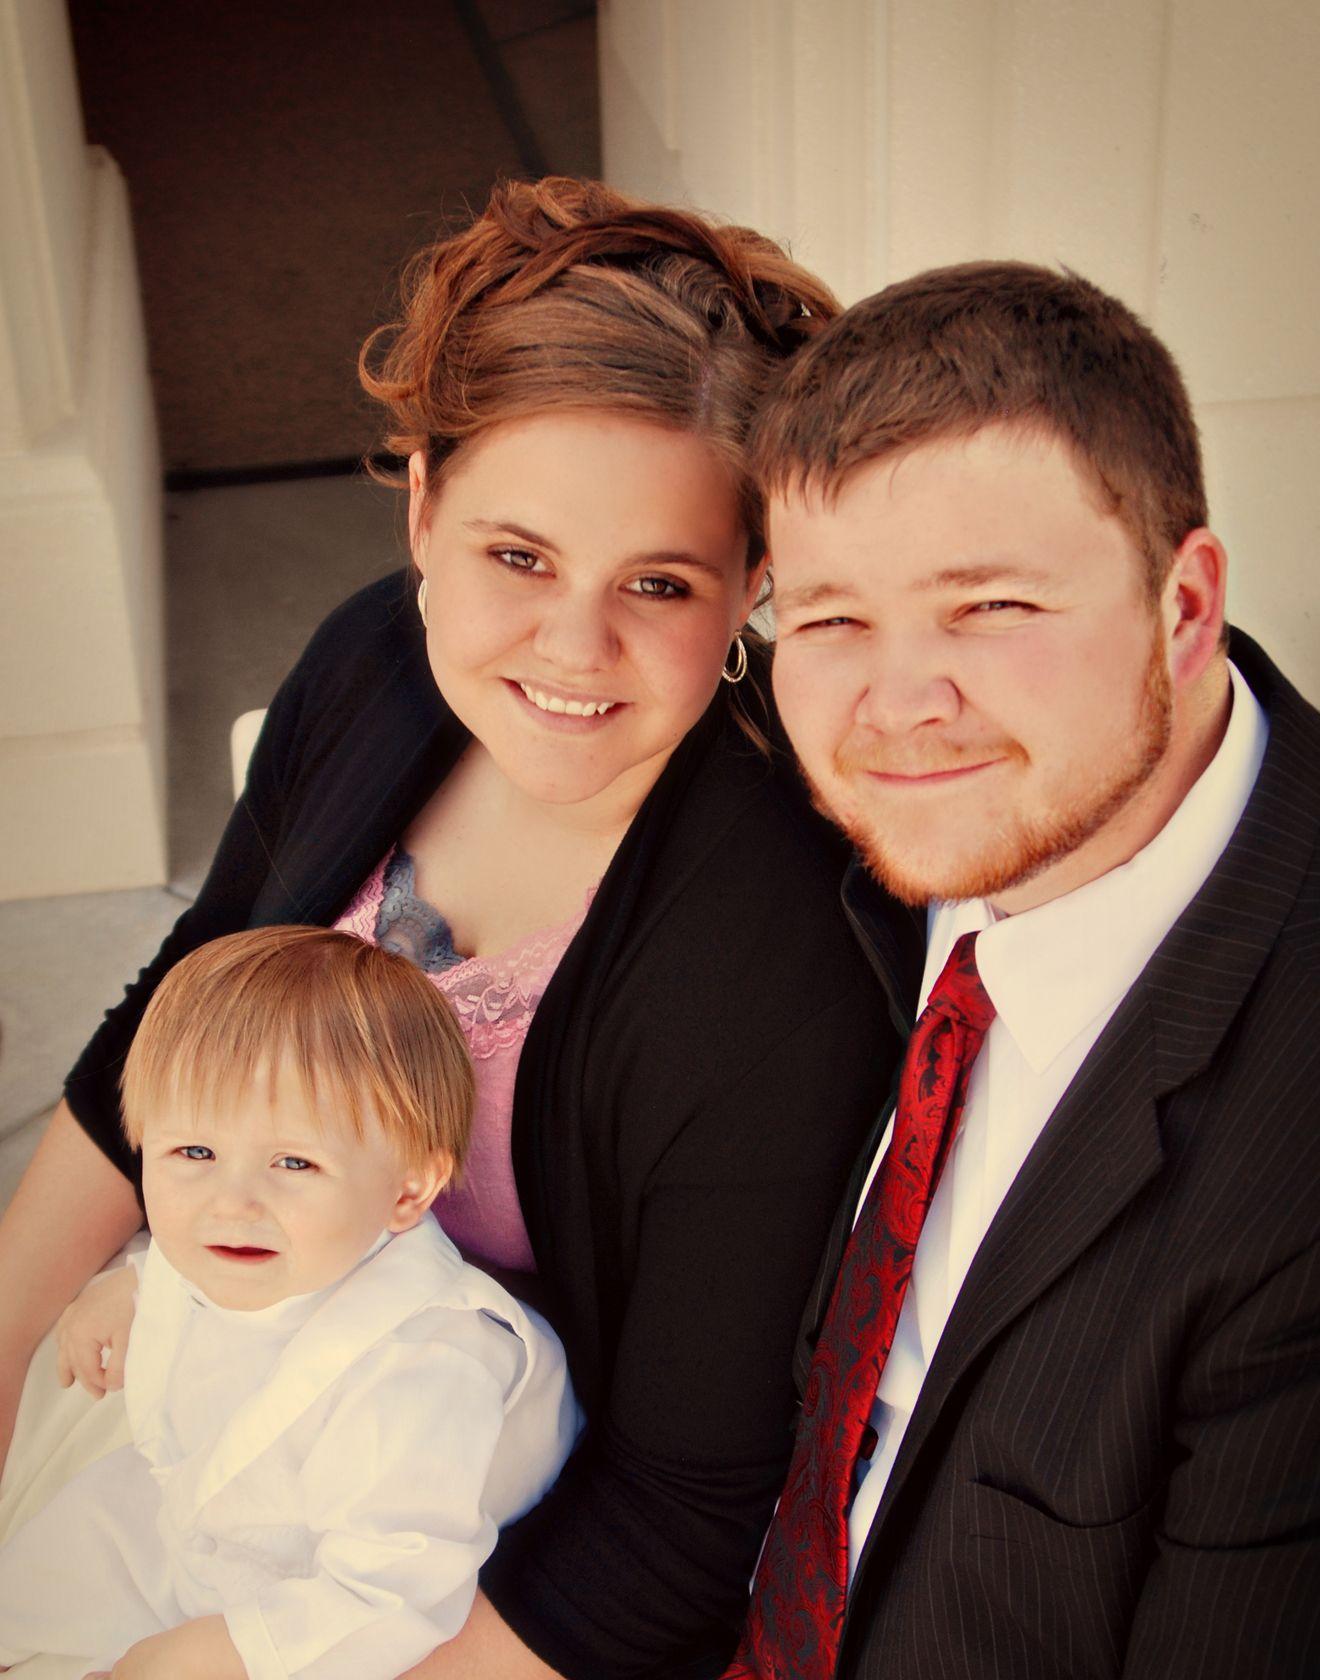 Family, photography inspiration, https://www.facebook.com/JennyLynPhotography?ref=hl